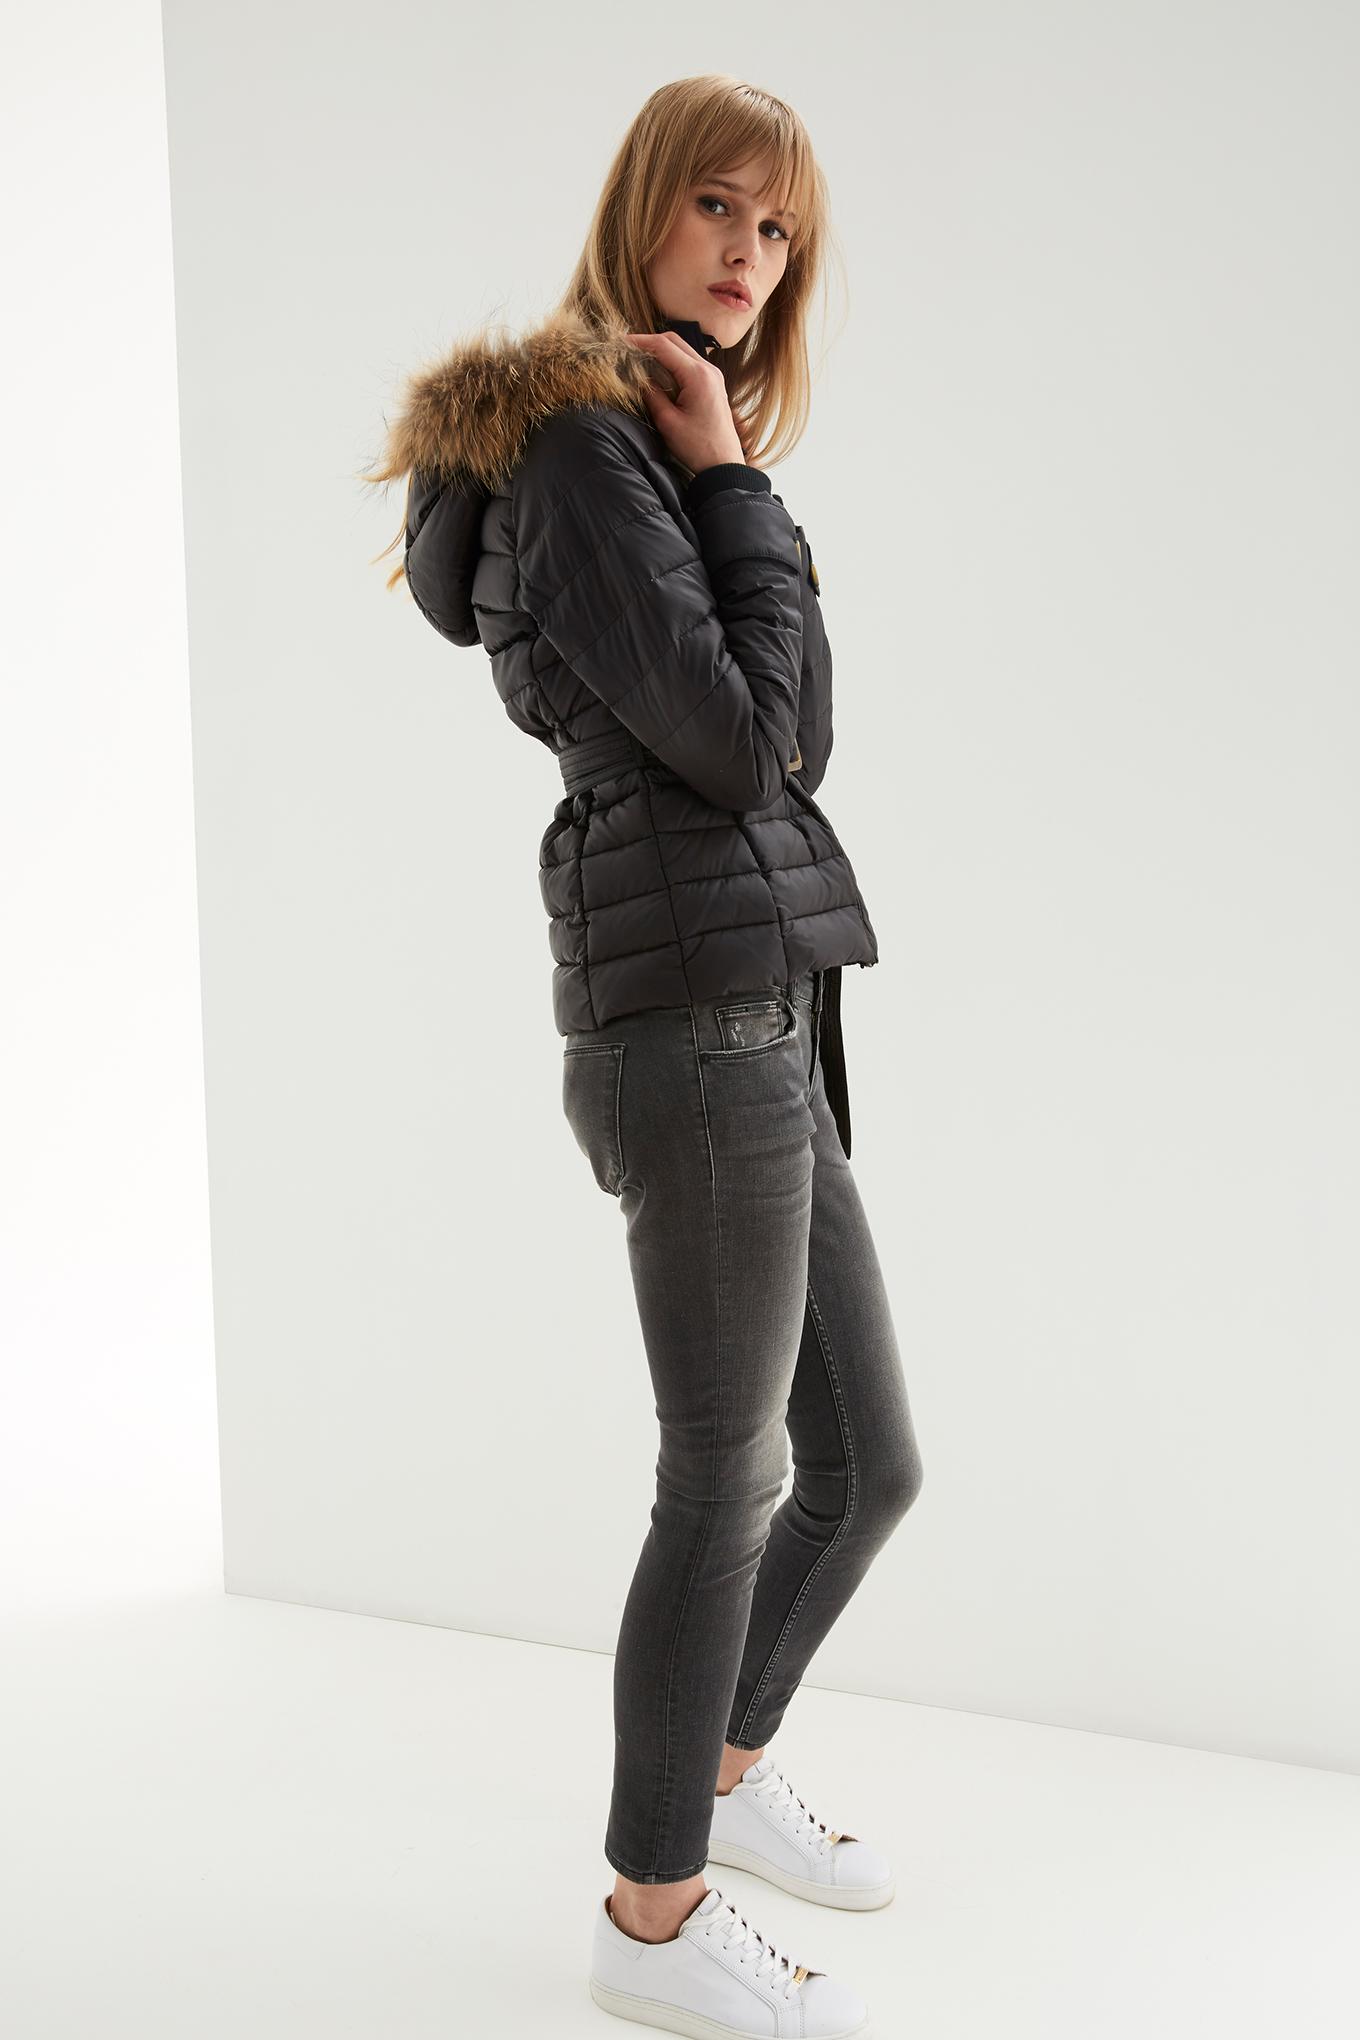 Jacket Black Casual Woman